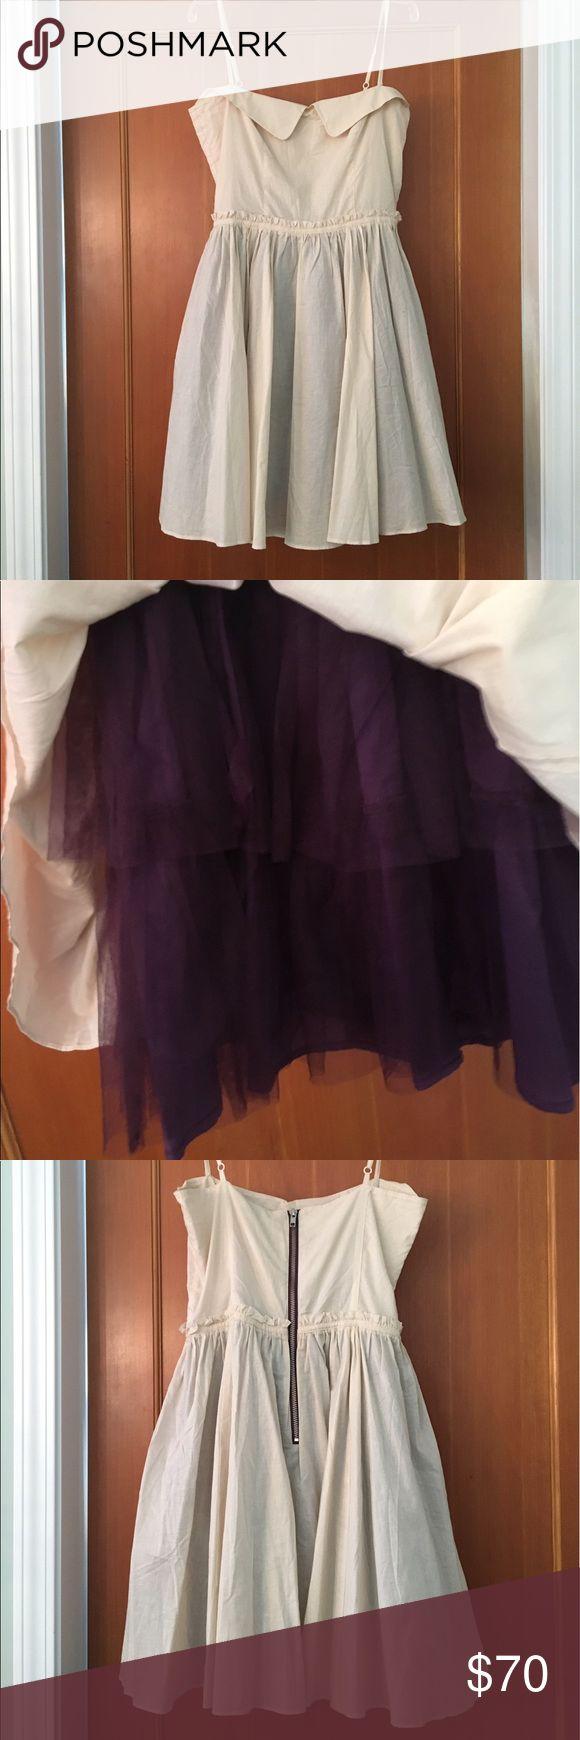 Cream tea party dress Cream tea party dress with purple tool underneath, zip in the back, worn once johnnie b Dresses Mini